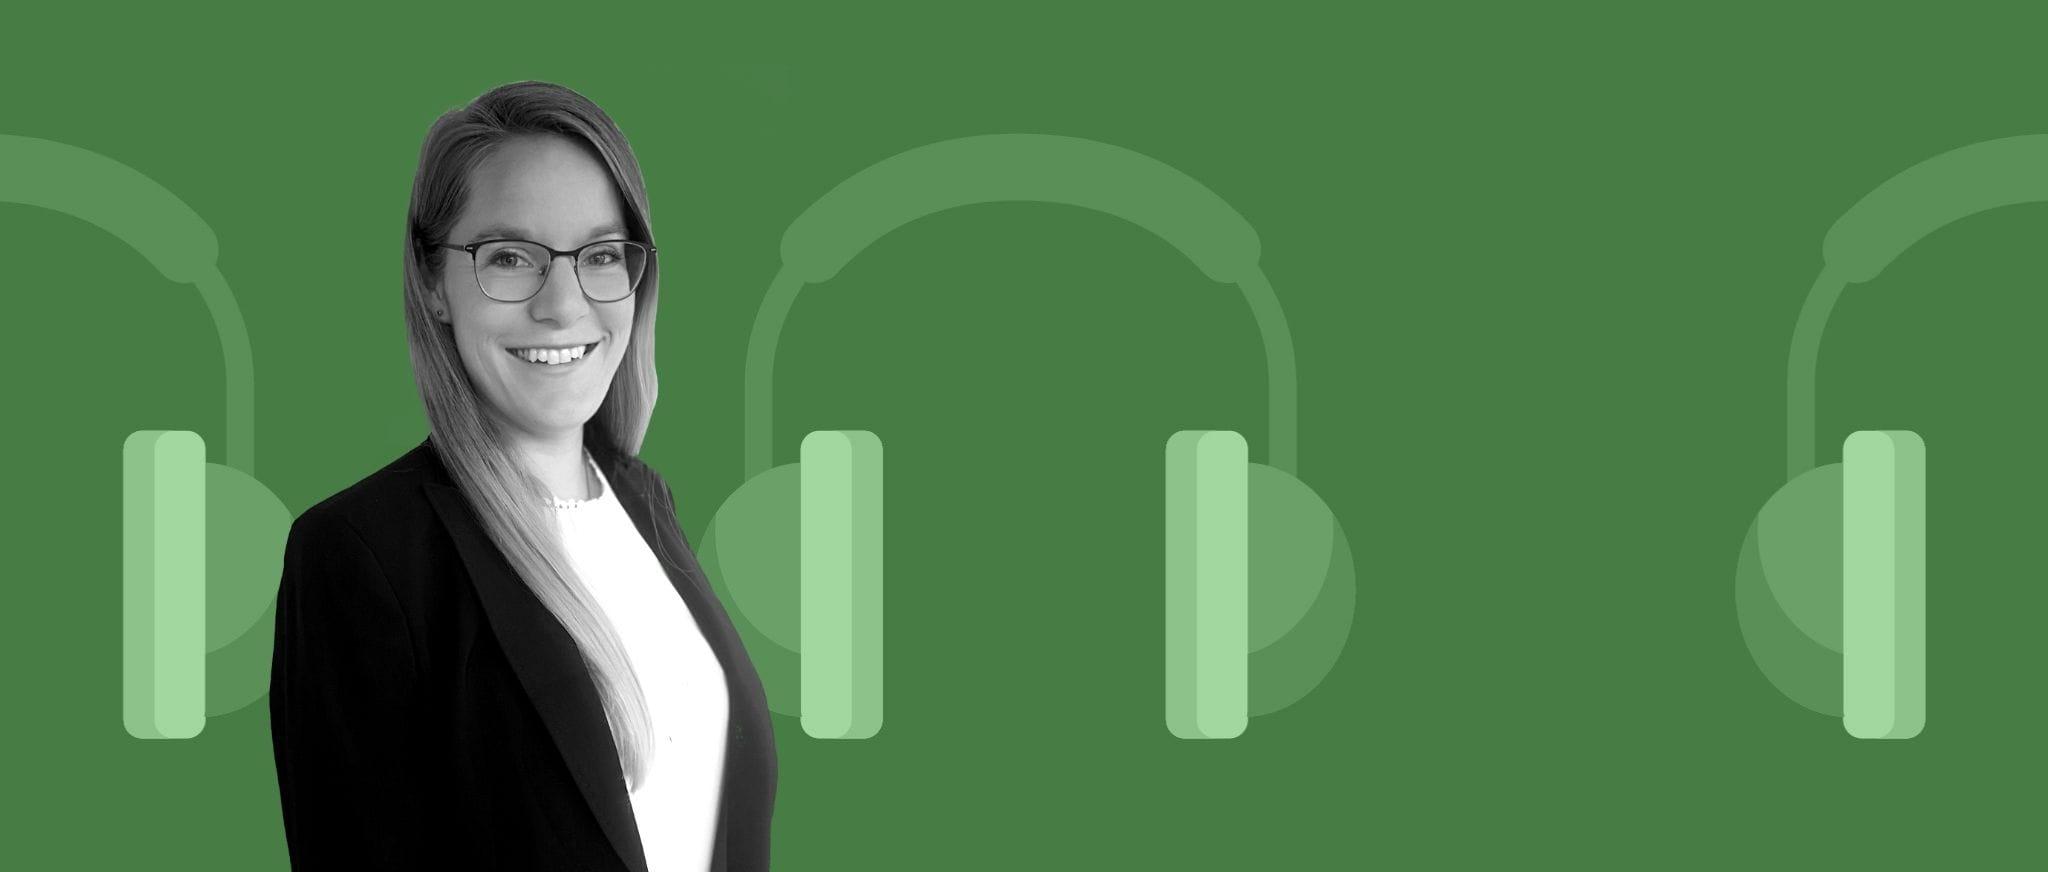 Titelbild_Podcast_Stephanie_Bosshard